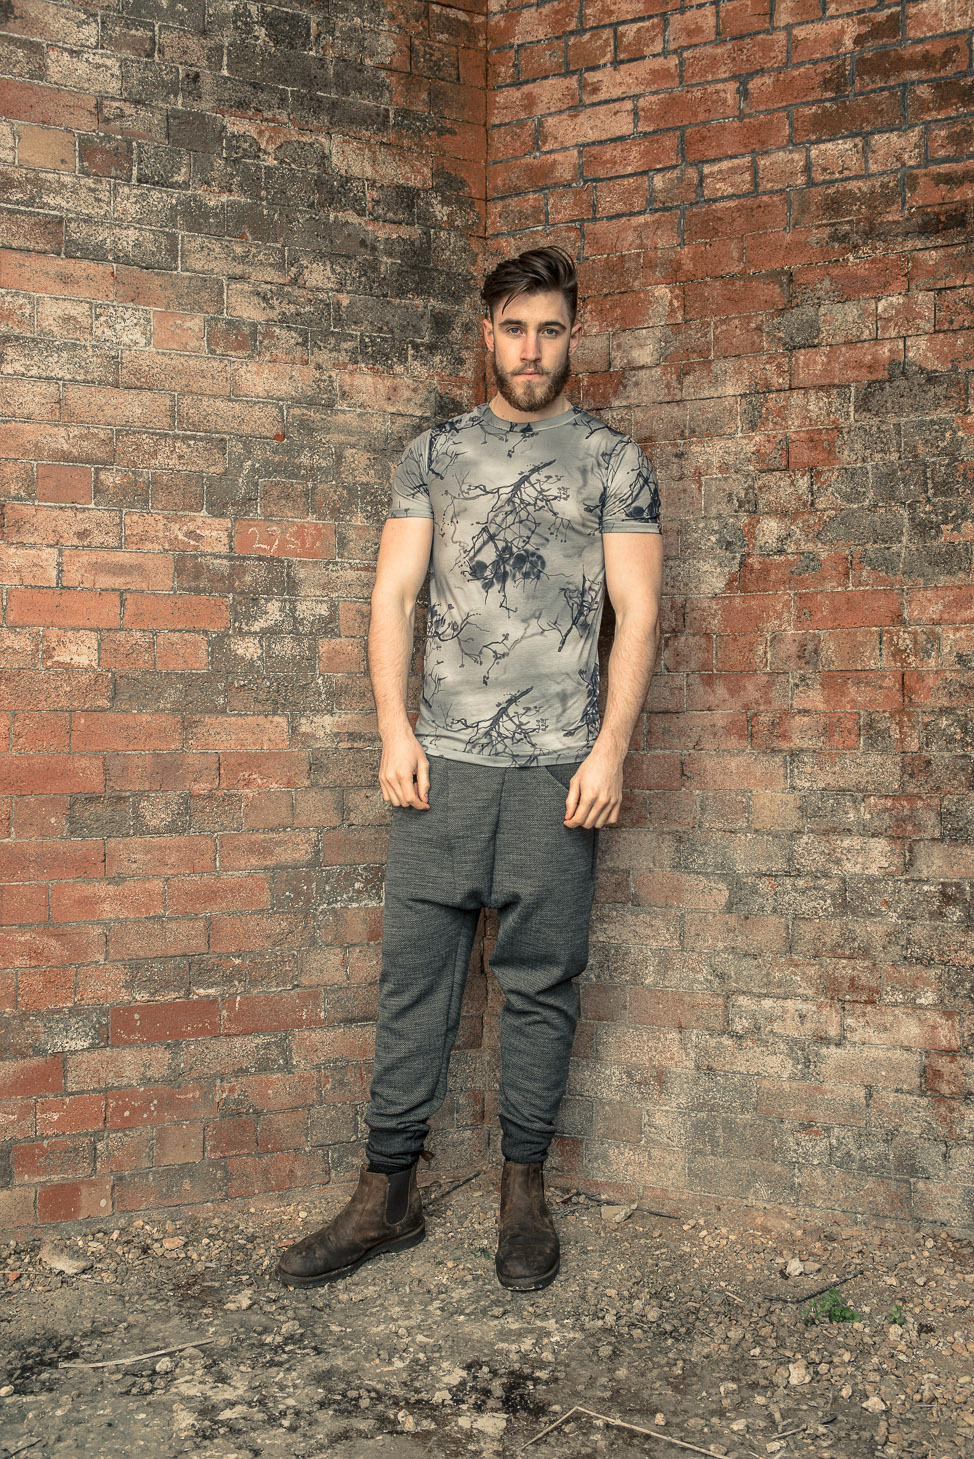 zaramia-ava-zaramiaava-leeds-fashion-designer-ethical-sustainable-tailored-minimalist-fitted-versatile-drape-koji-grey-tshirt-top-hareem-trousers-black-grey-texture-styling-menswear-model-21